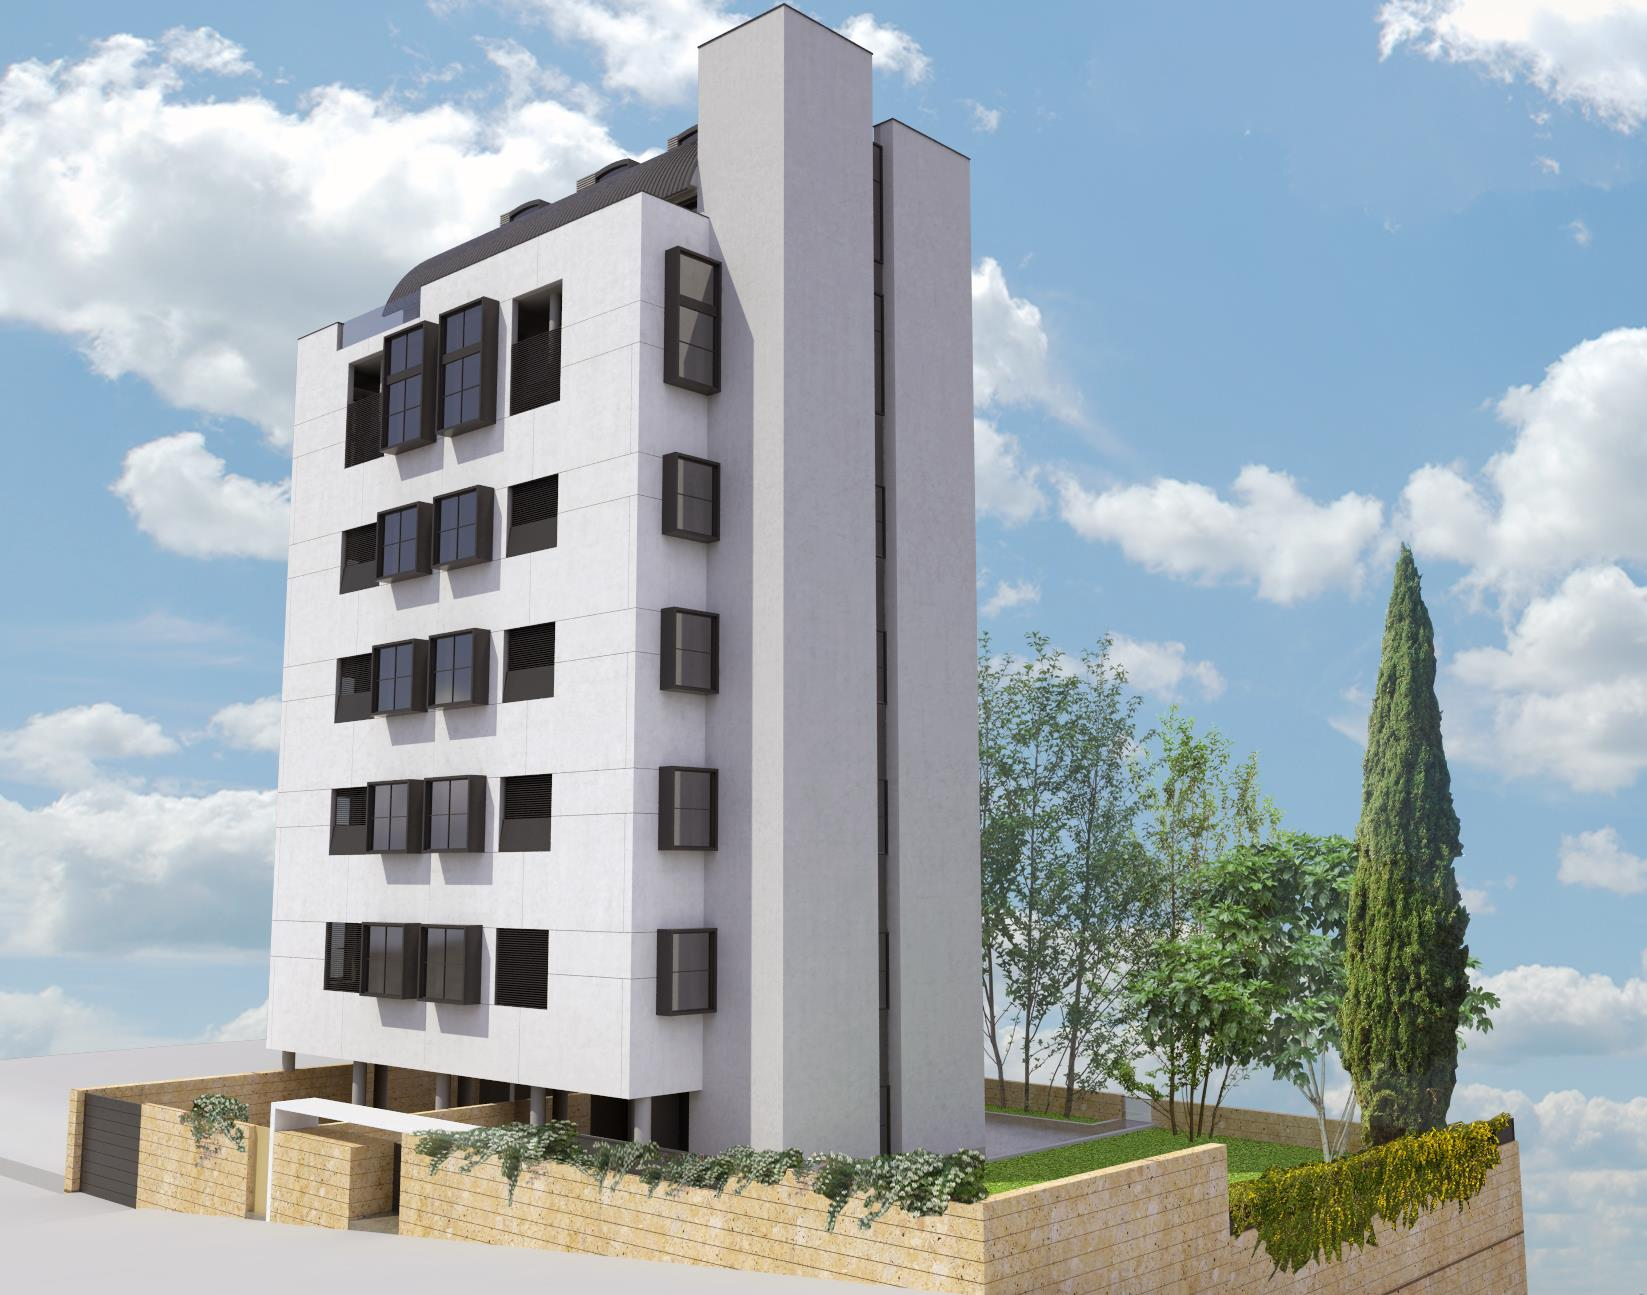 Piso 1 habitacion madrid elegant piso en alquiler en madrid ascensor with piso 1 habitacion - Calle nebulosas madrid ...